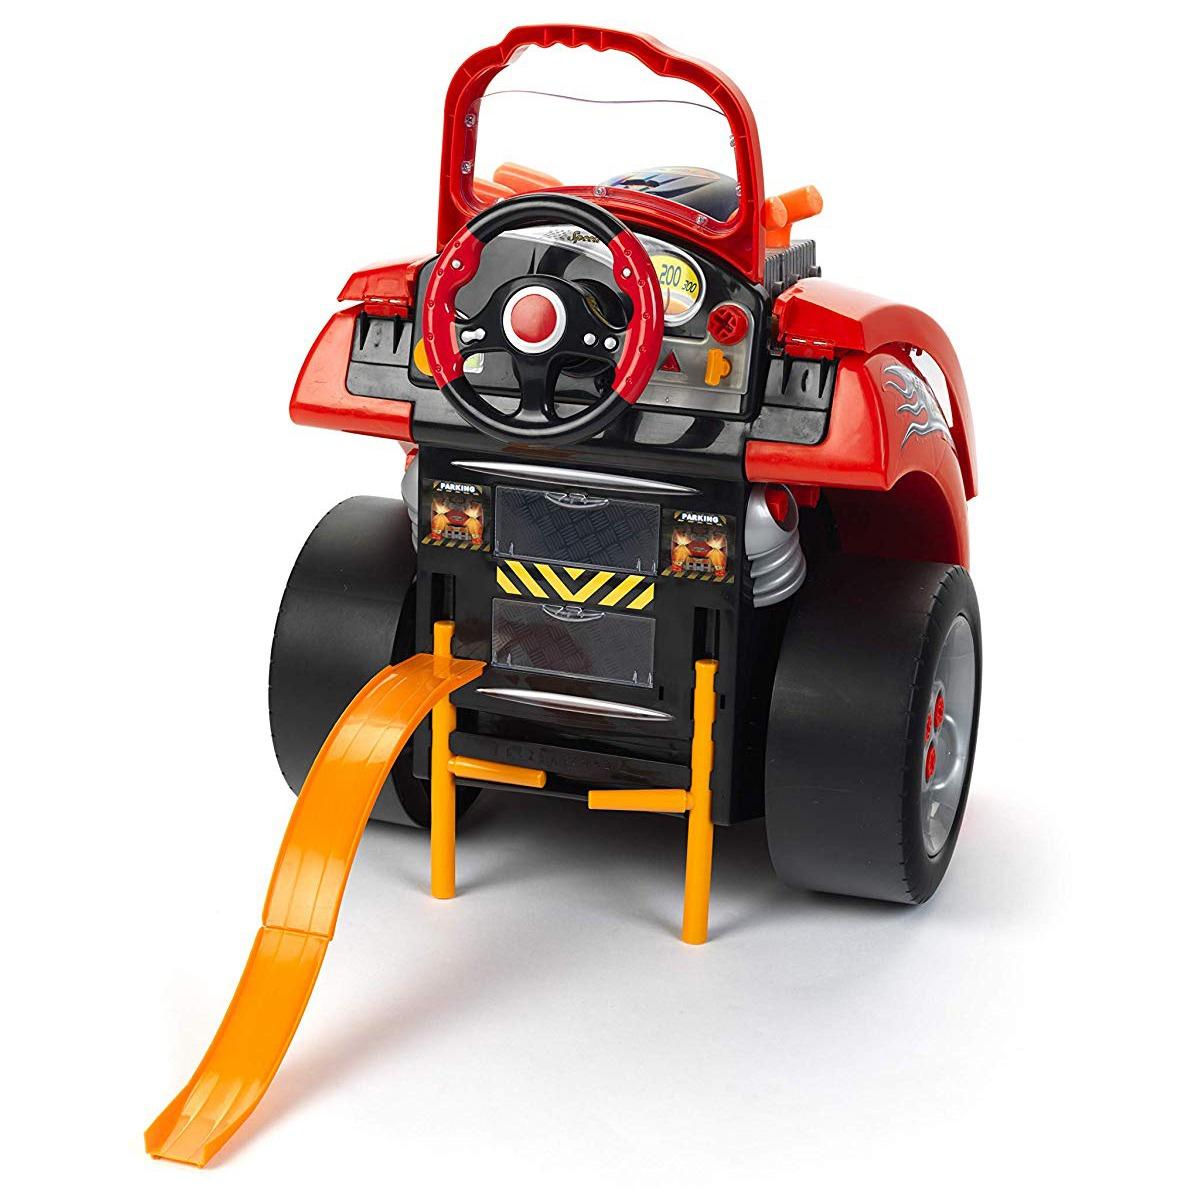 Mechanic's Toy Car 3